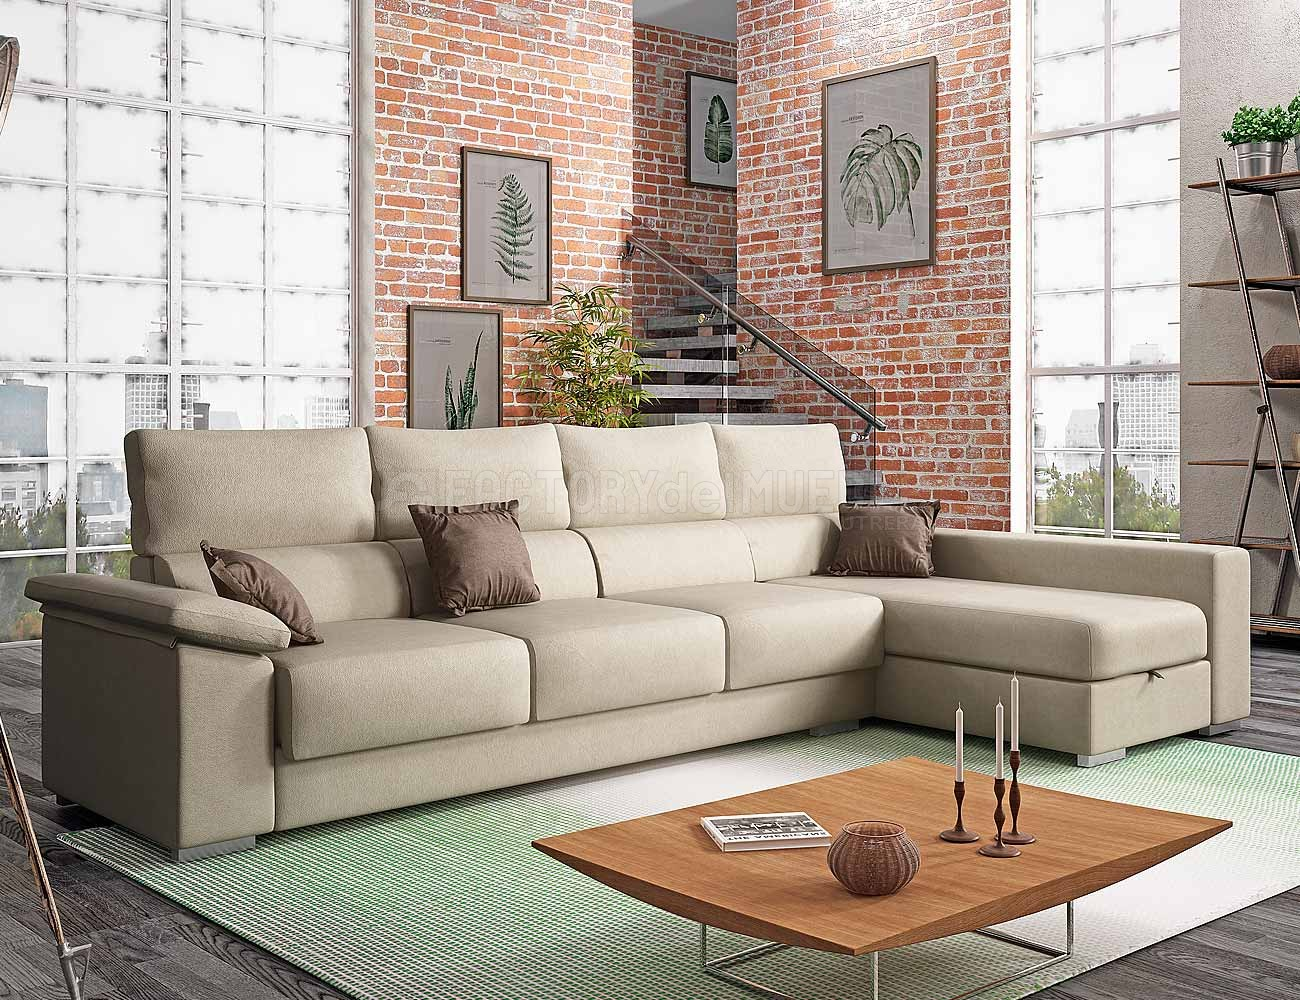 Sofa chaiselongue3